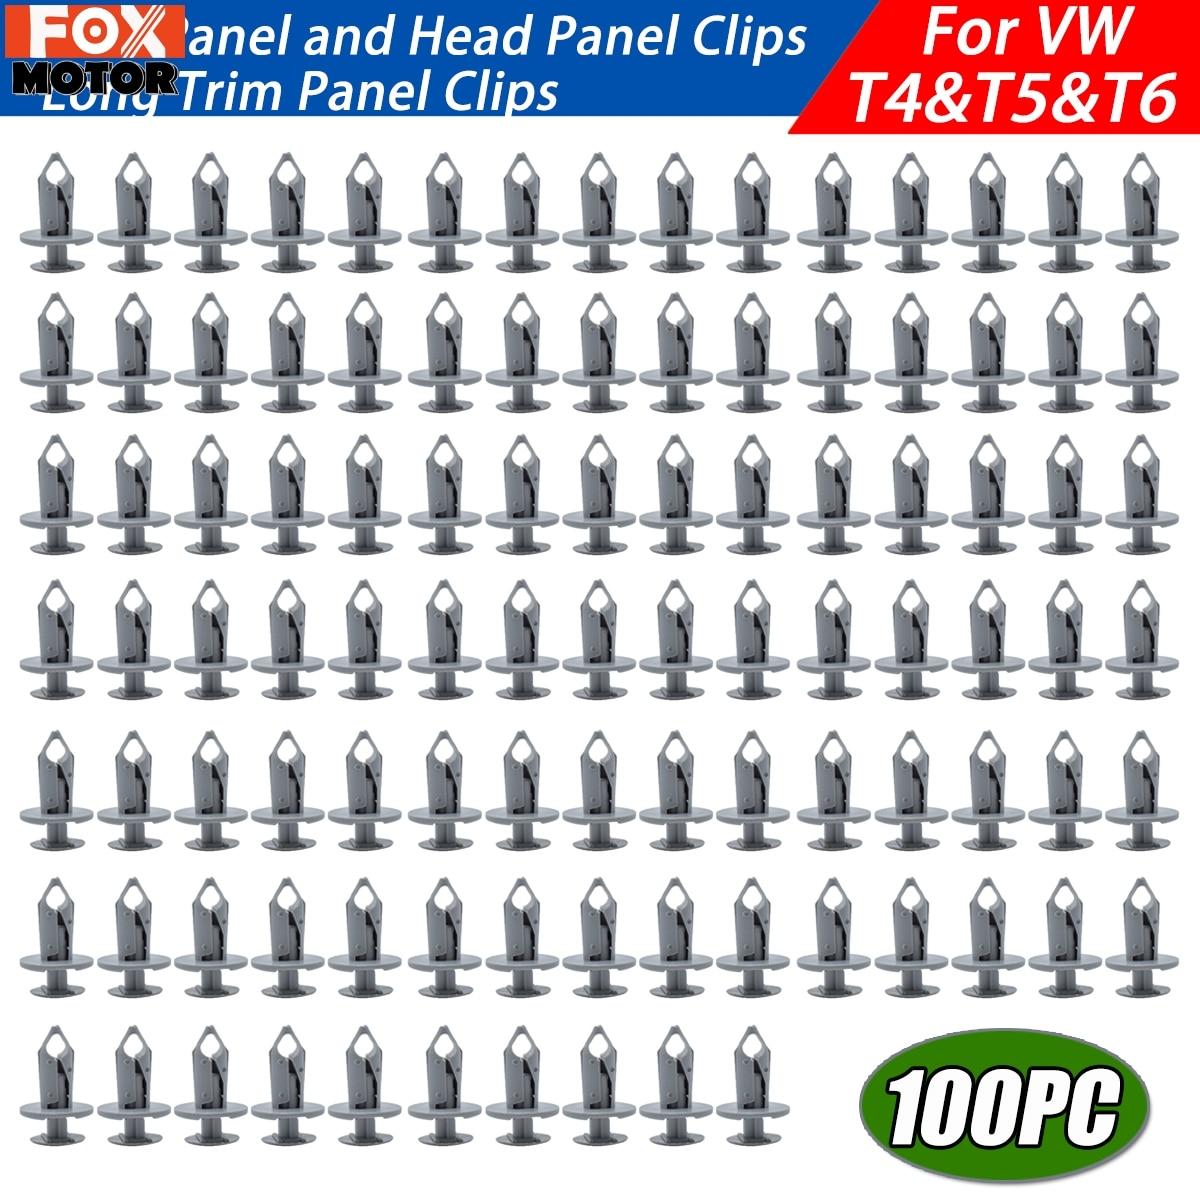 100 piezas para VW Transporter T4 T5 T6 Clips de Panel de corte largo más largo alfombra gris forro plástico retenedor remaches Auto parachoques sujetadores